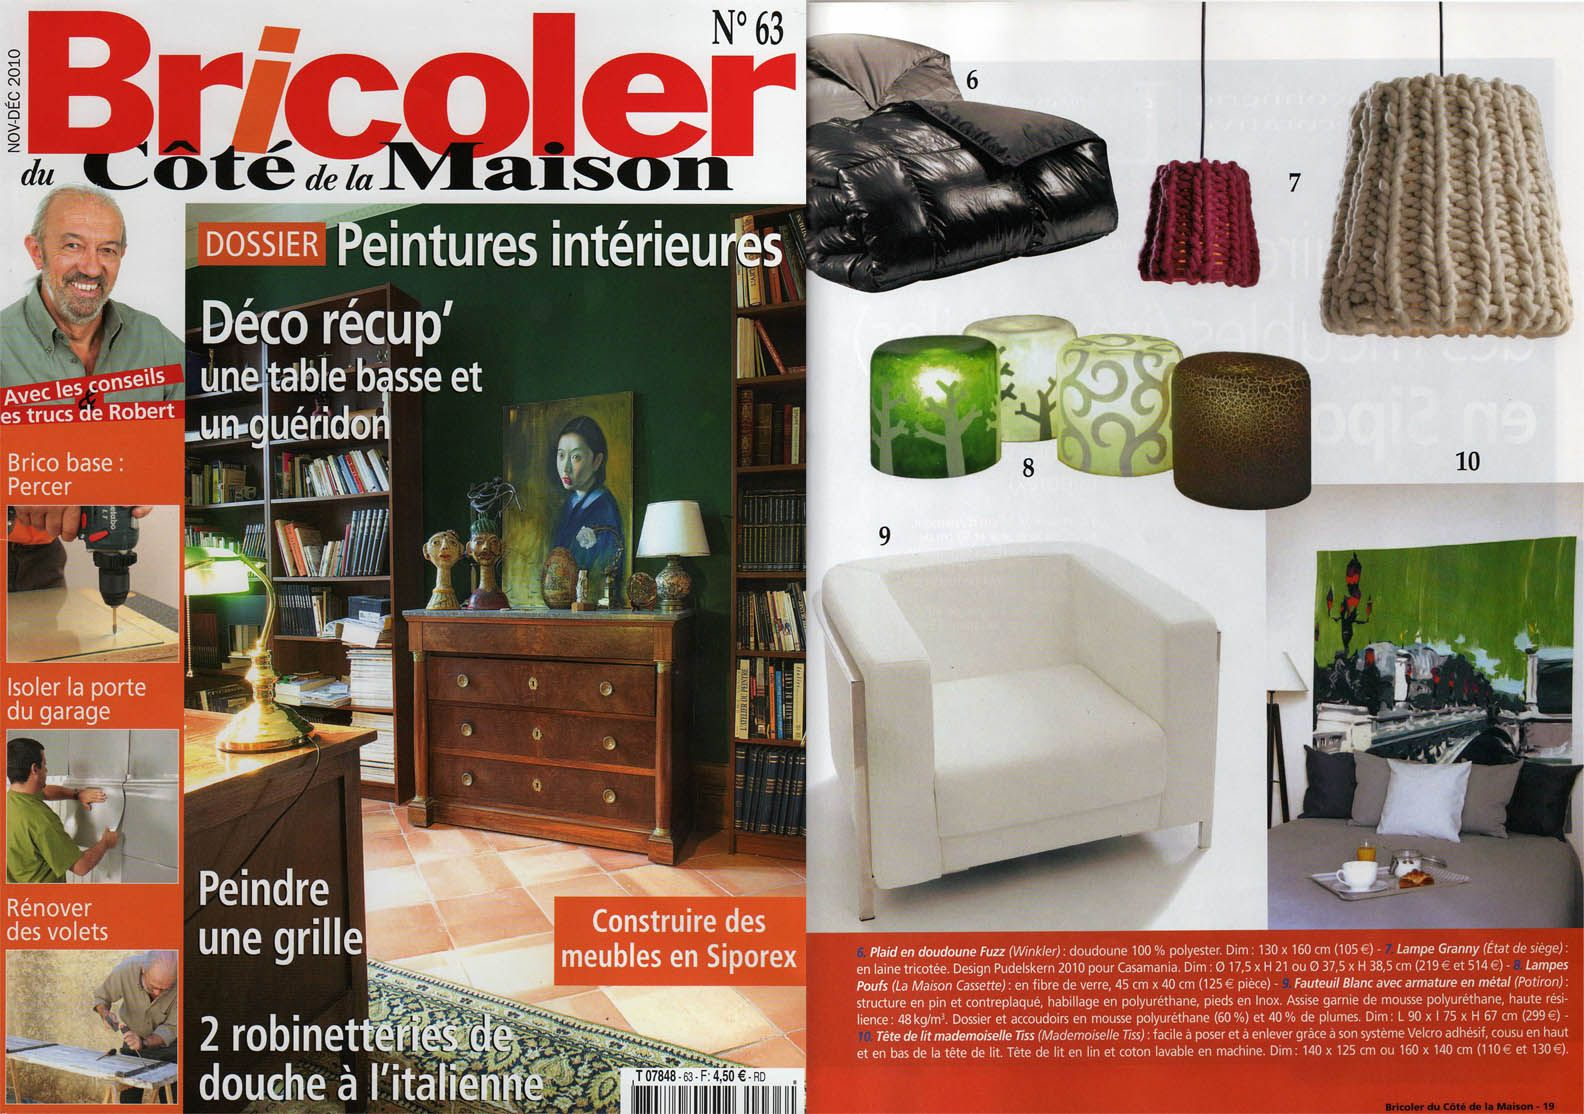 bricoler du cot de la maison ventana blog. Black Bedroom Furniture Sets. Home Design Ideas